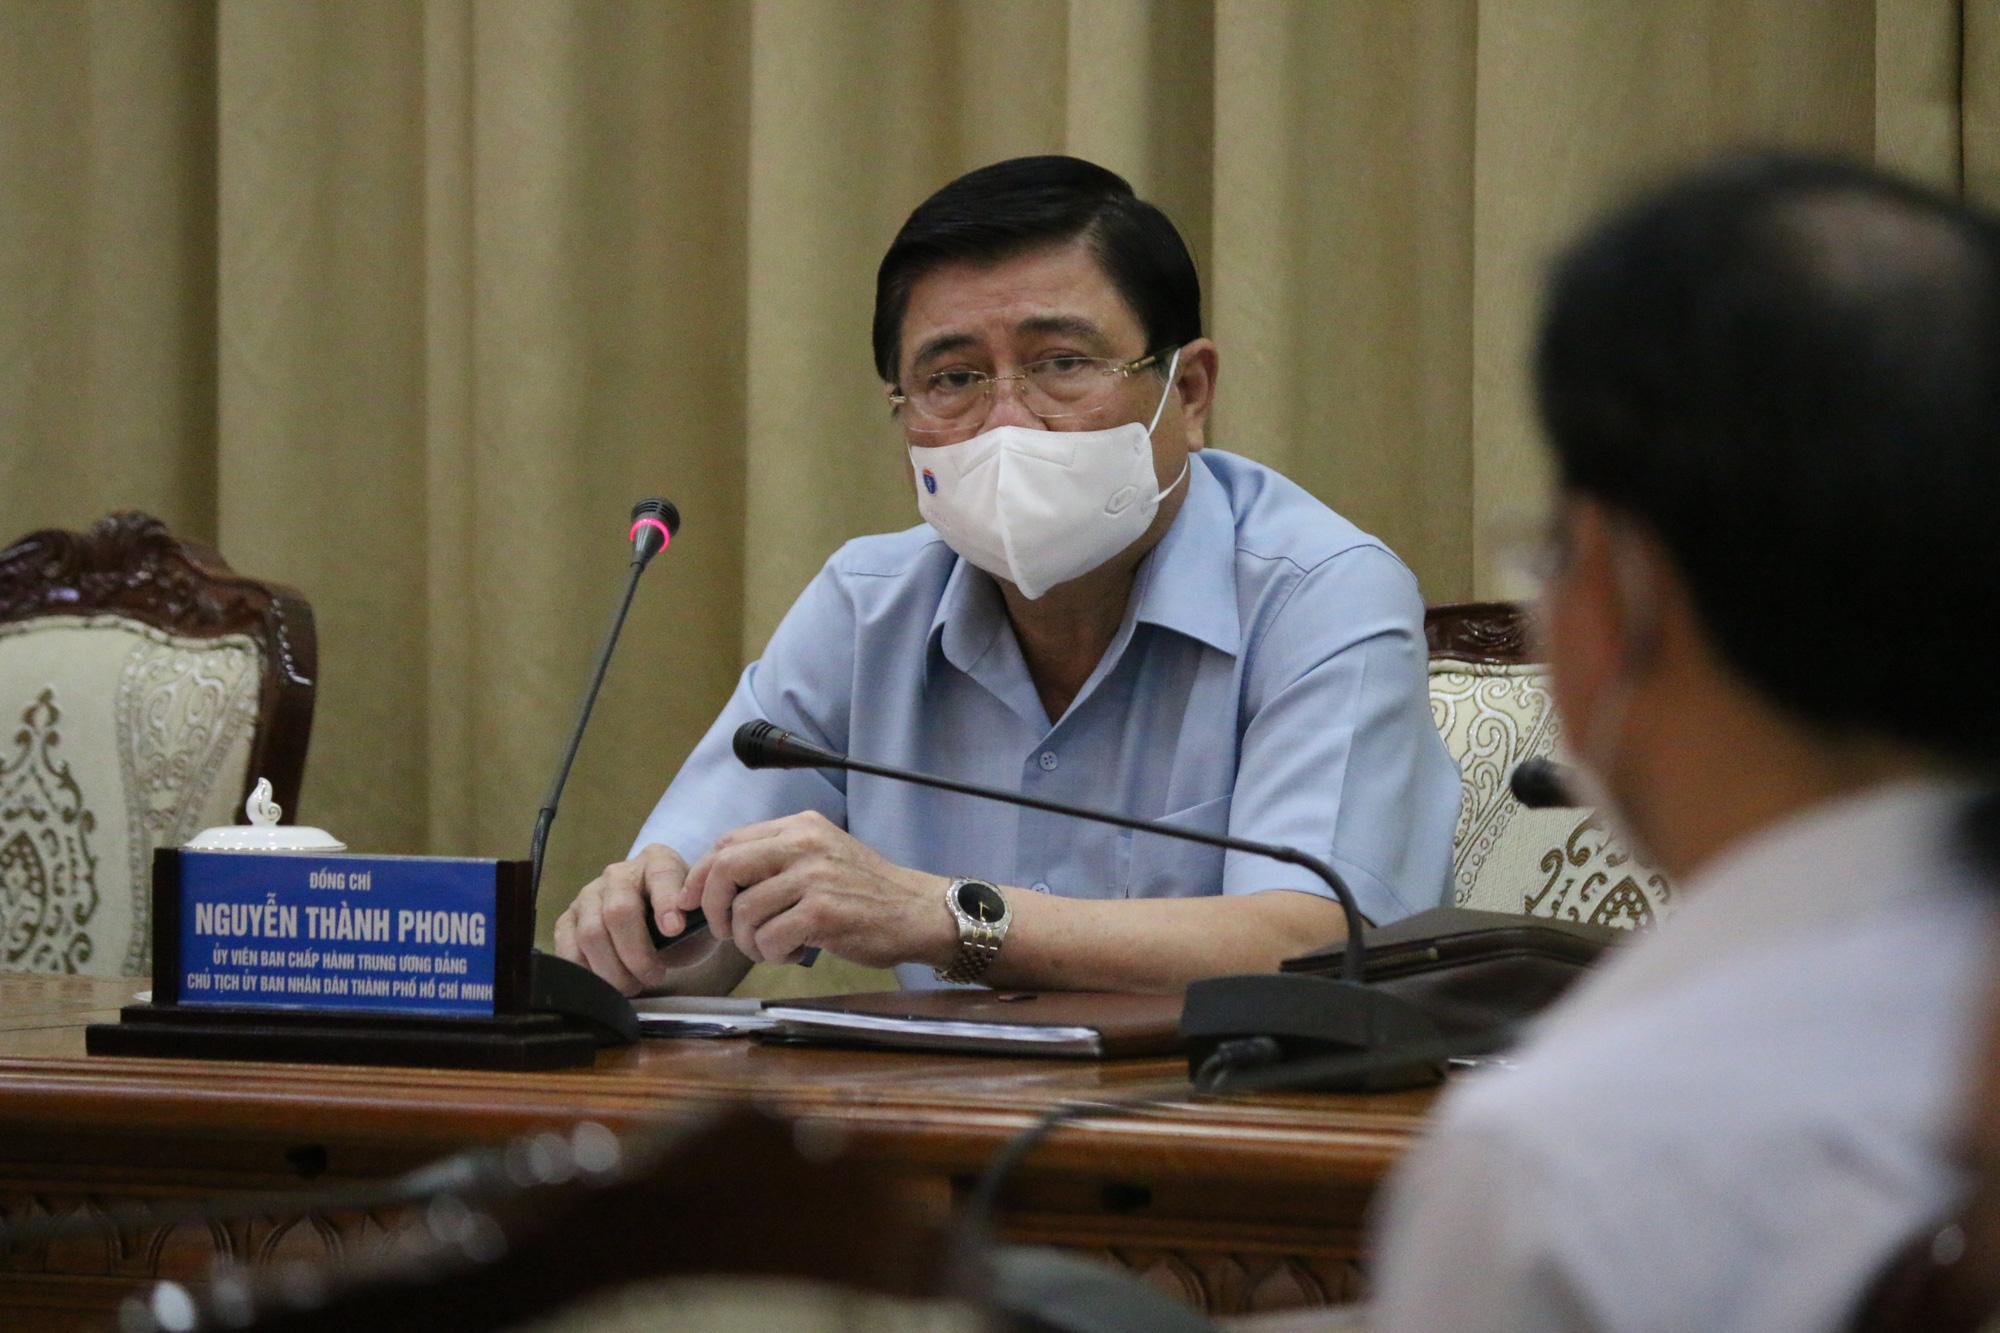 Ho Chi Minh City closes cinemas, theaters to curb COVID-19